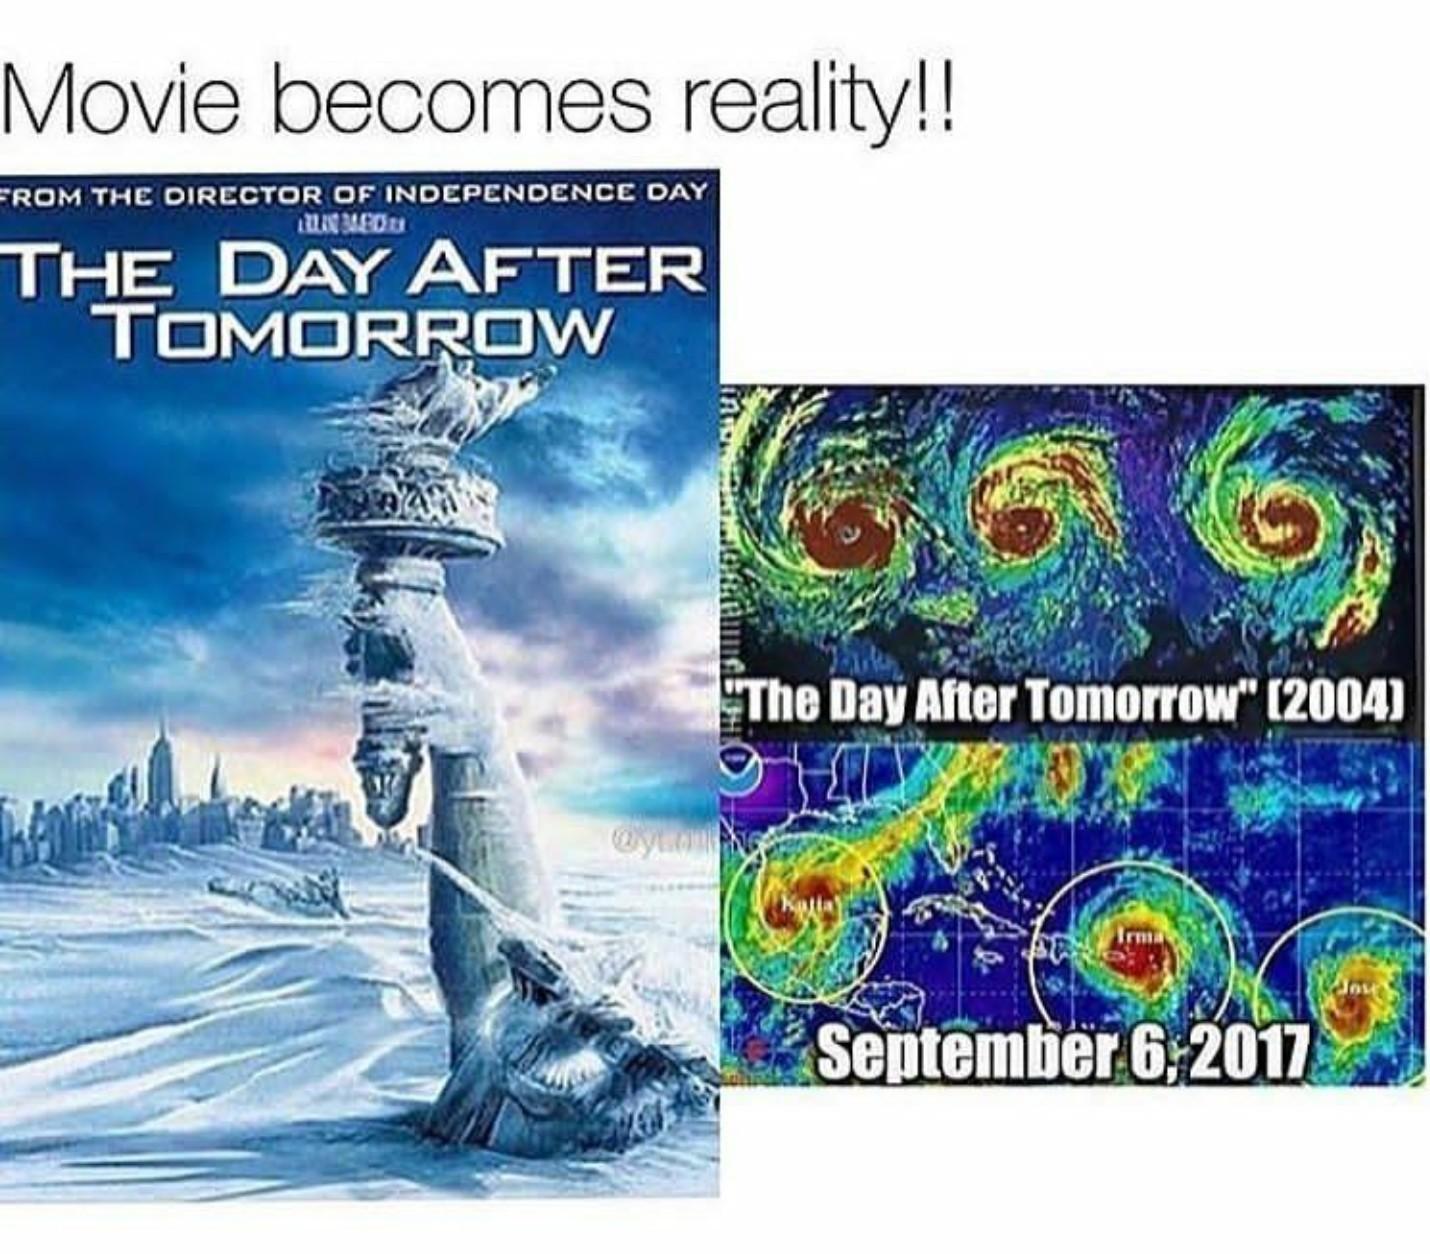 This movie was ok - meme